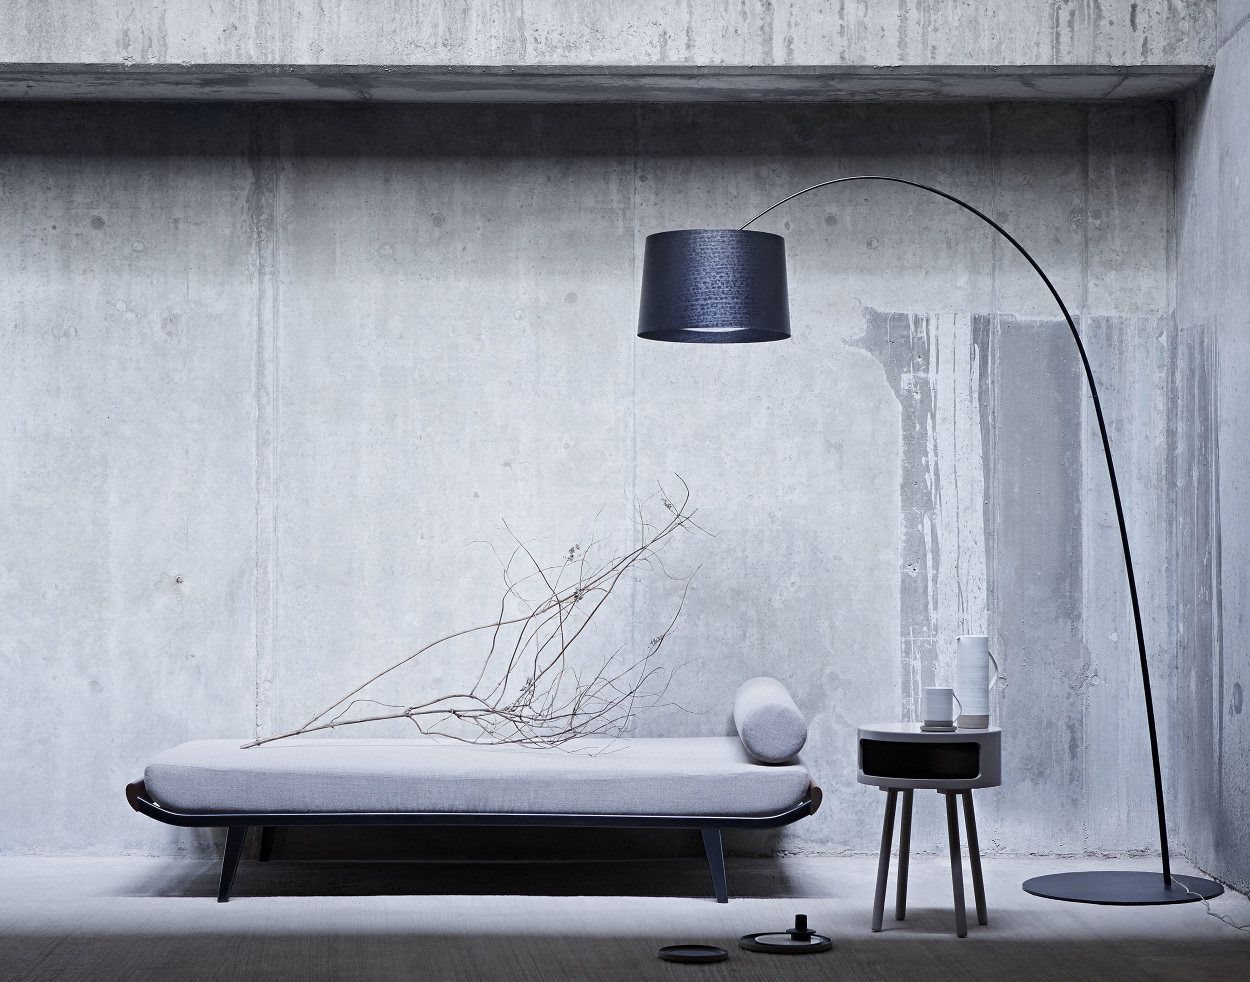 for Interior stylist london